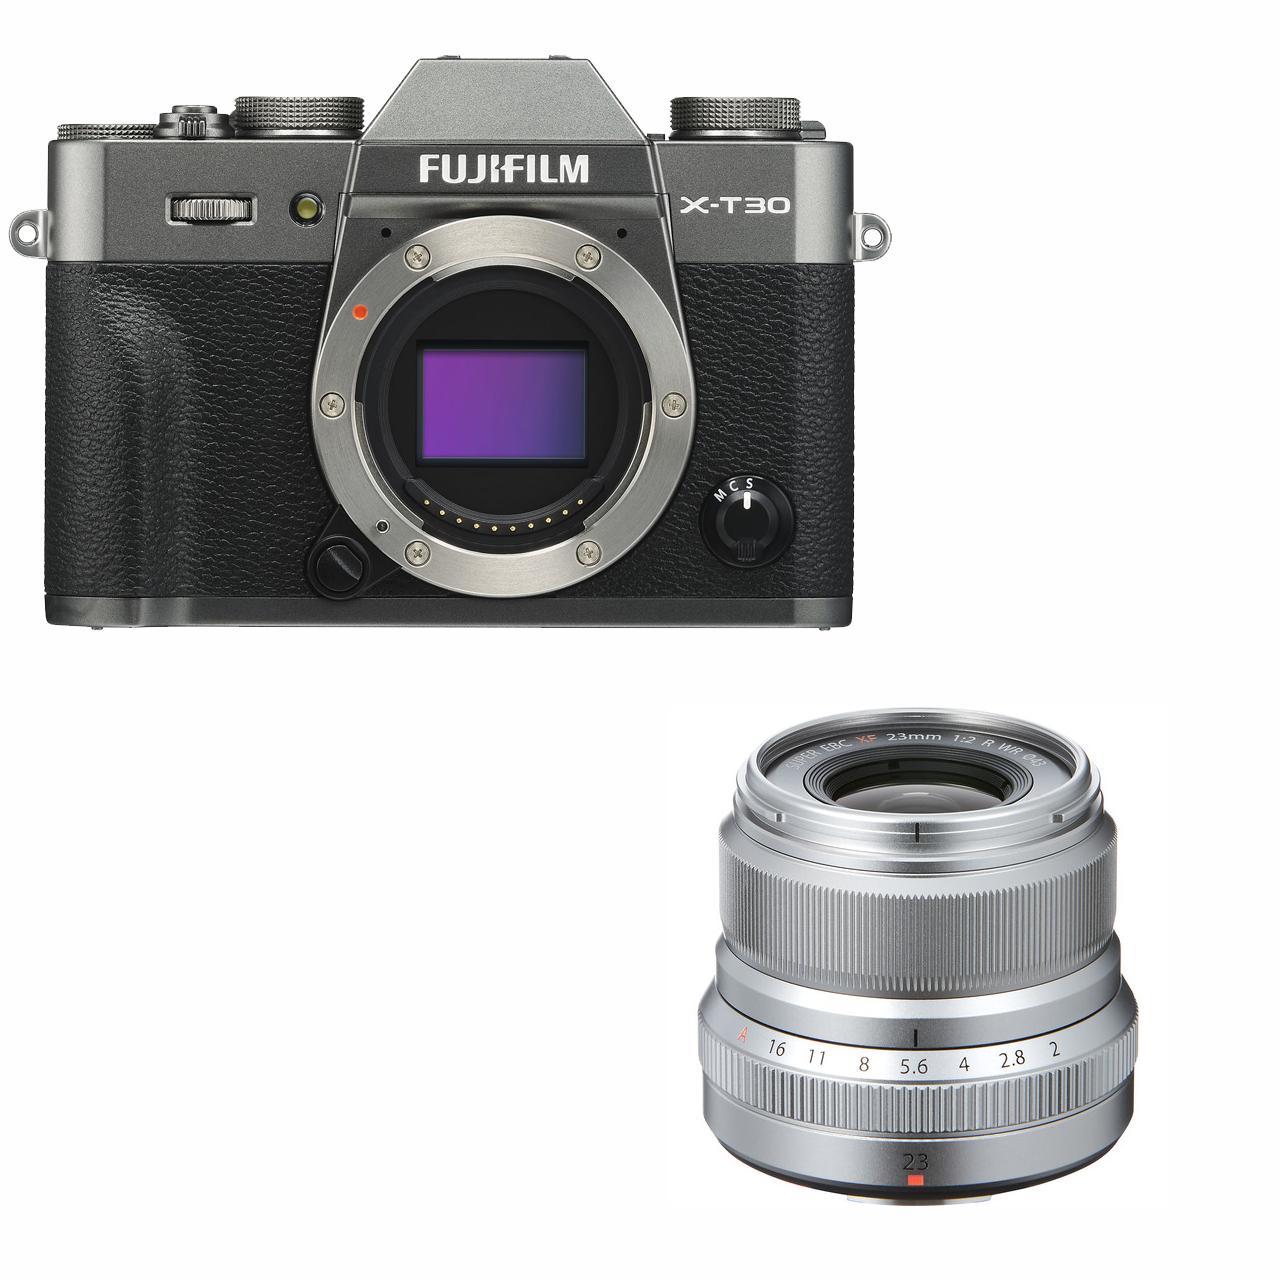 Fujifilm X-T30 mørk sølv + XF 23mm XF 23mm f/2.0 R WR sølv